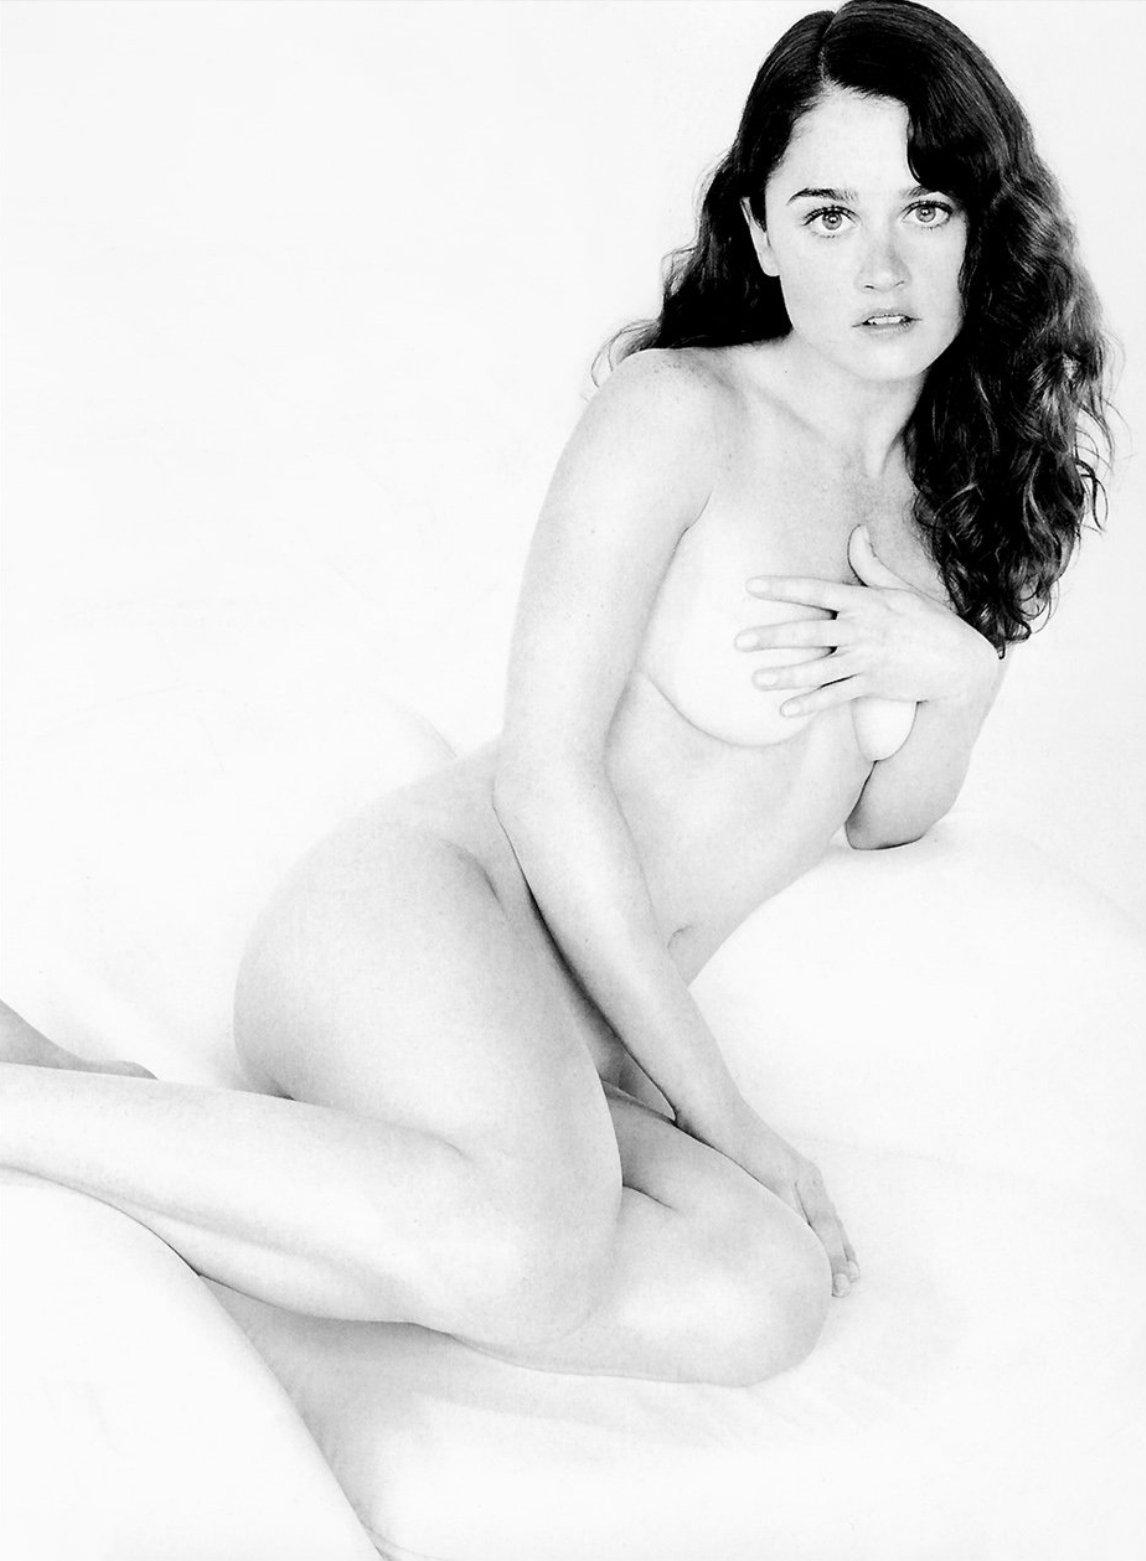 Robin-Tunney-Nude-1